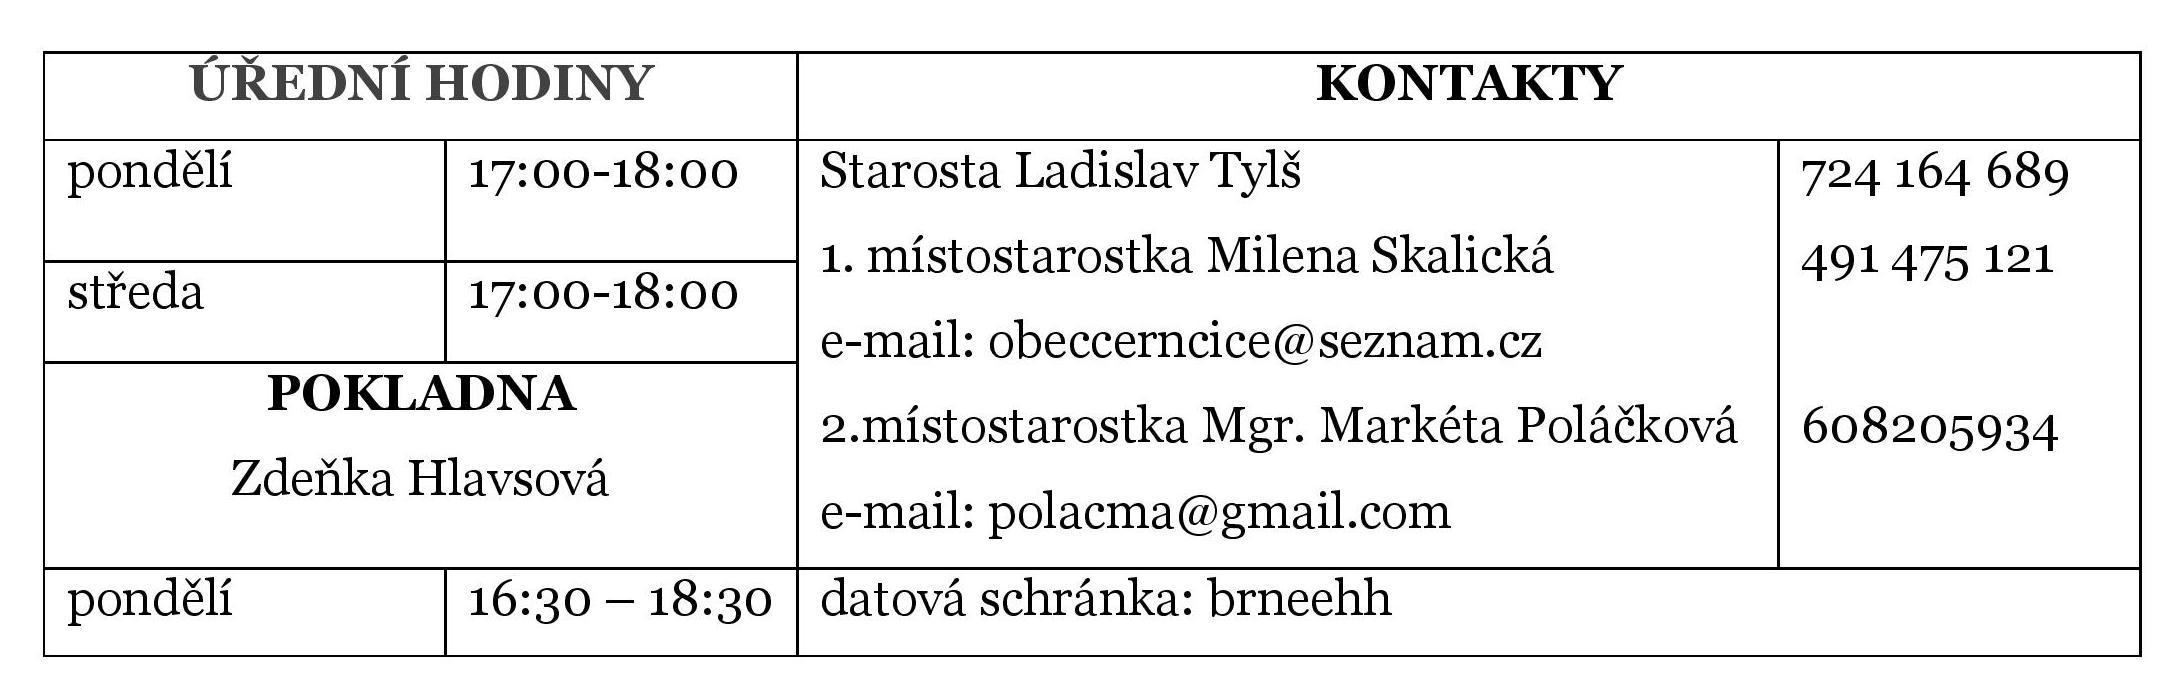 KONTAKTY-page-001 (1)